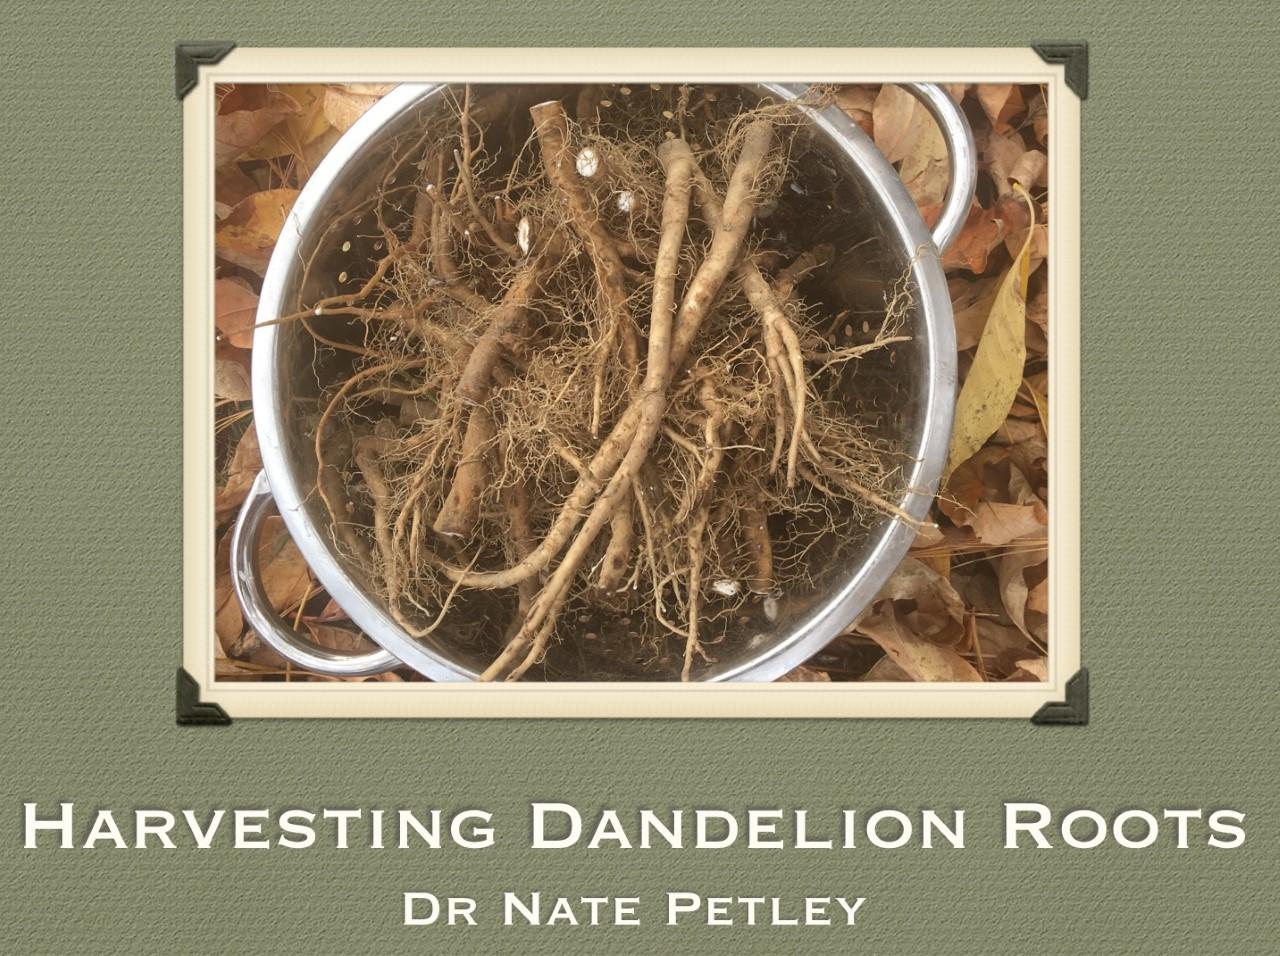 Roasted Dandelion Root Tea (Part 1)